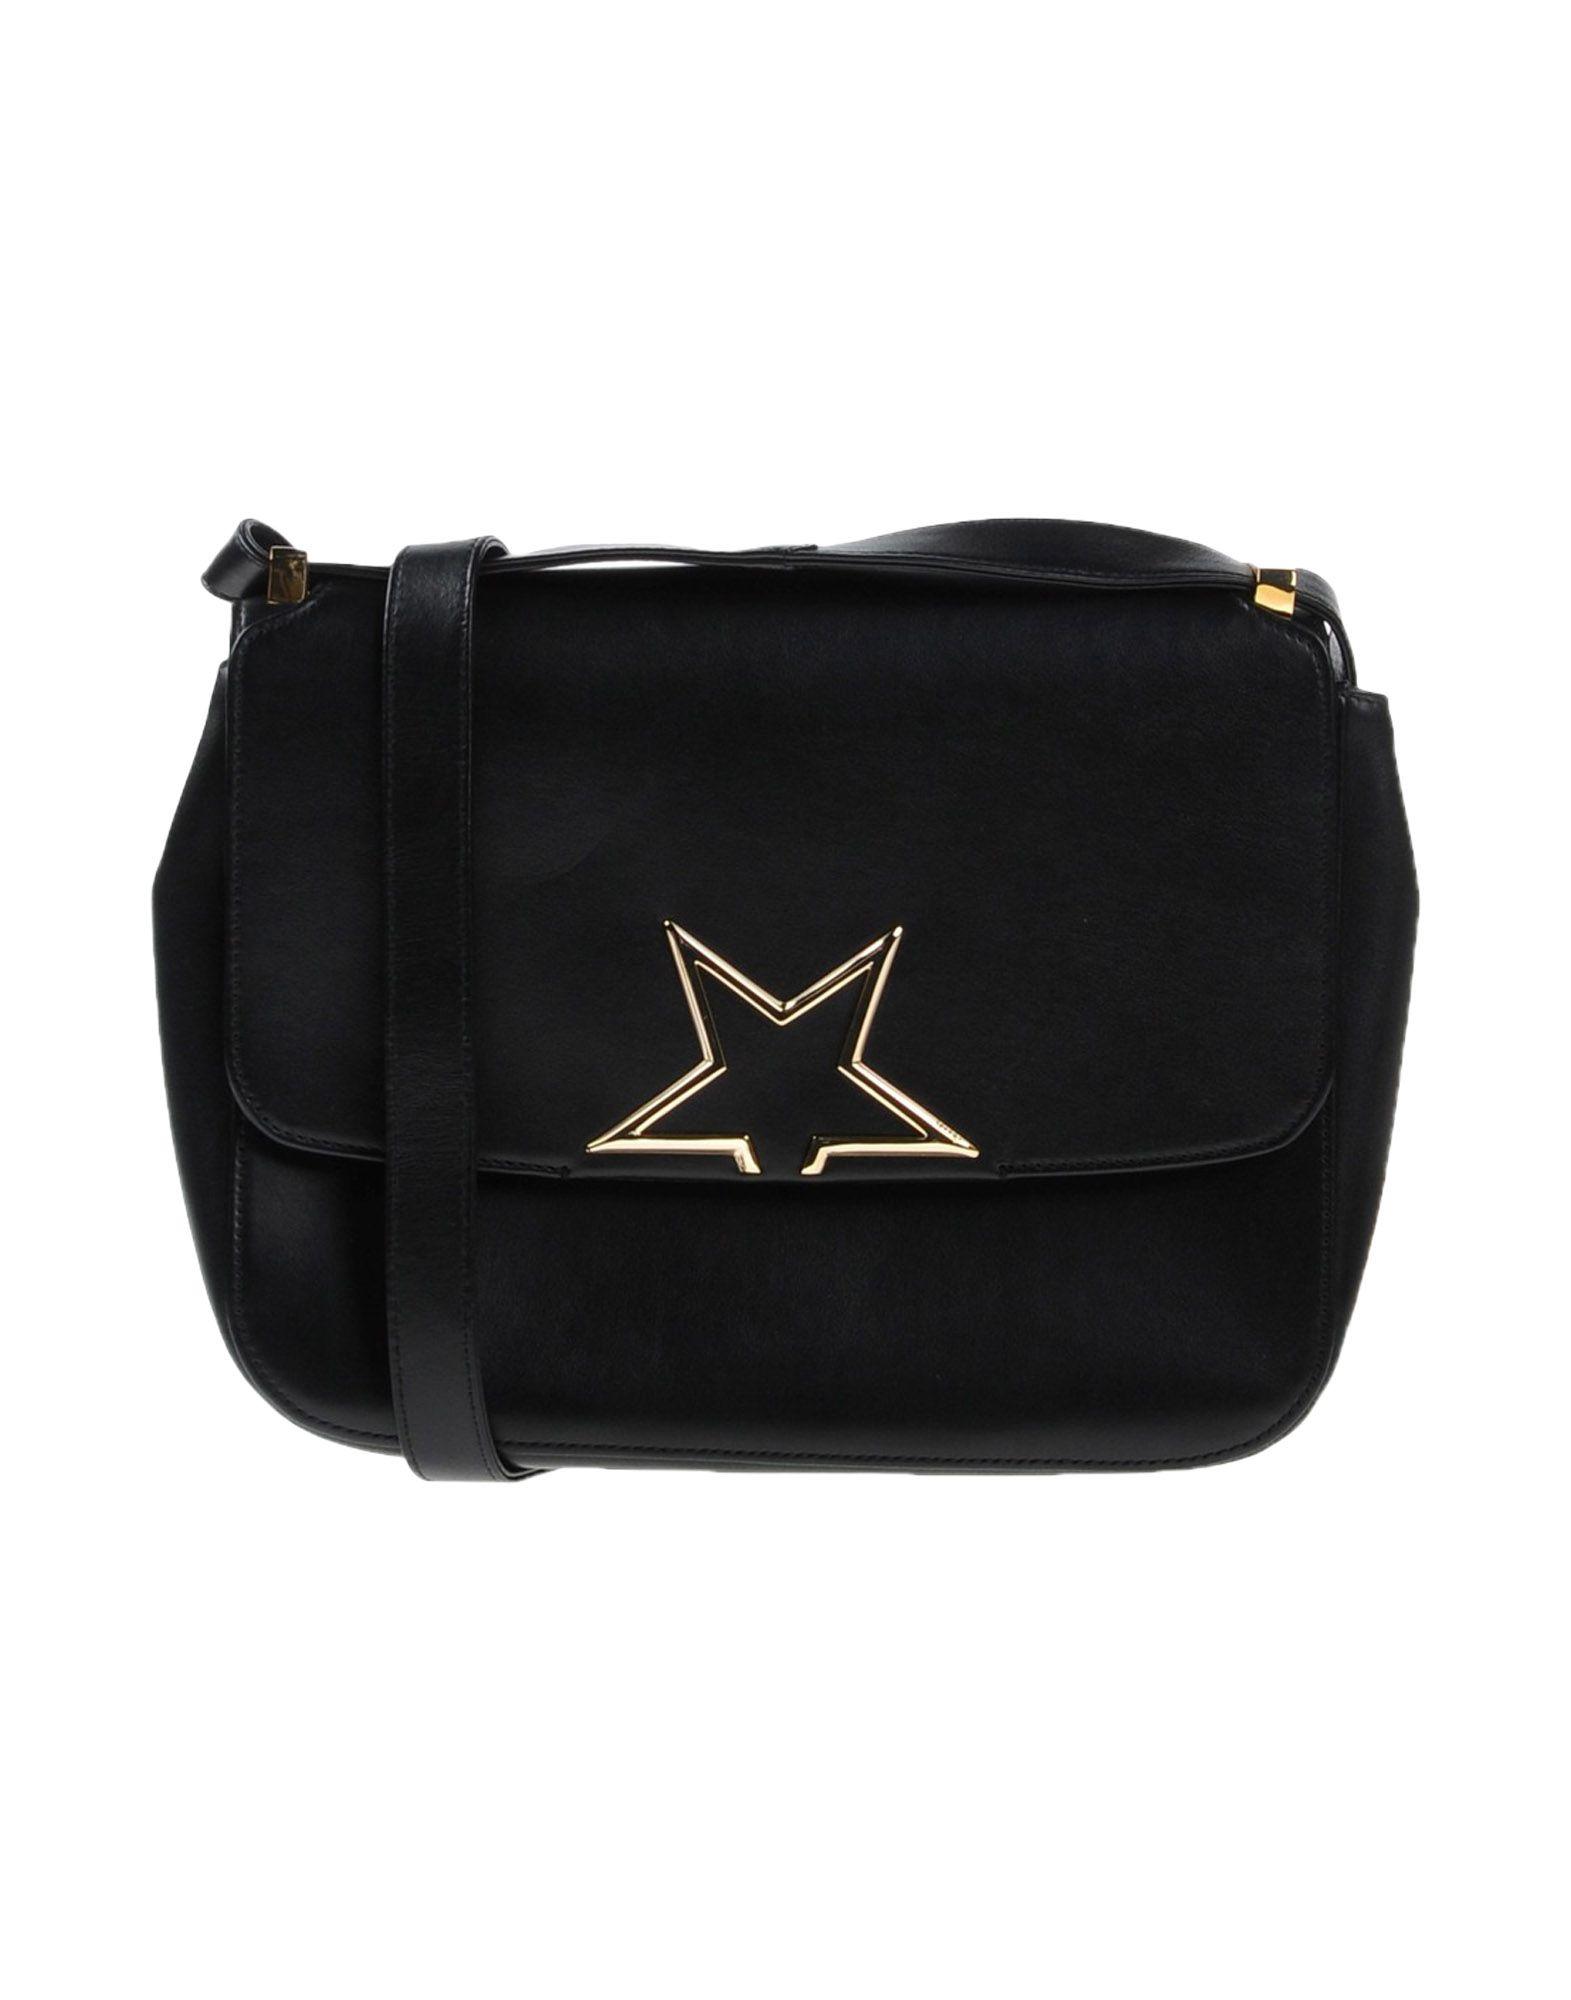 GOLDEN GOOSE DELUXE BRAND Сумка через плечо сумка через плечо brand new 2015 rhnwb0001